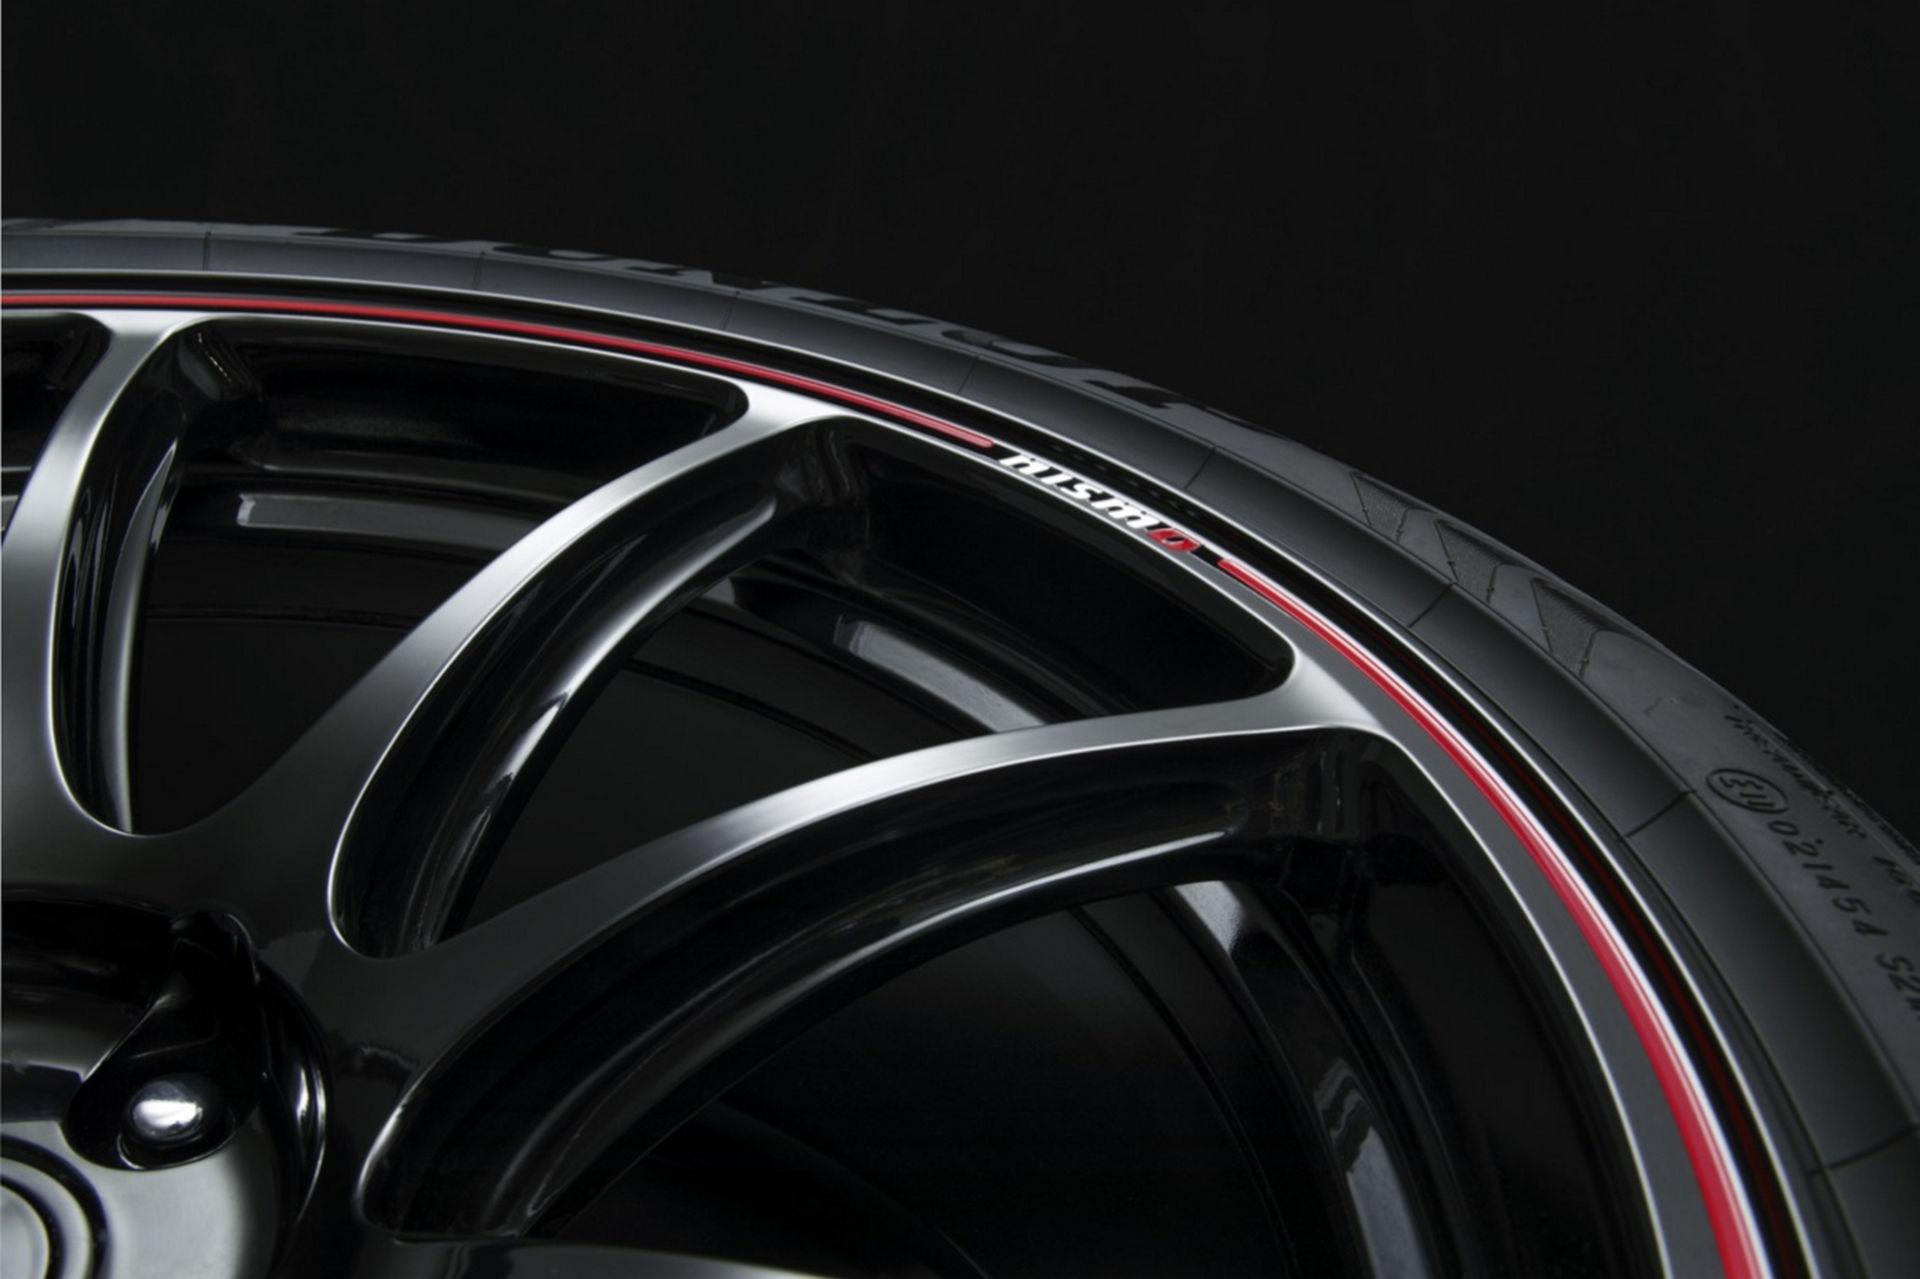 2022-Nissan-GT-R-Nismo-39.jpg